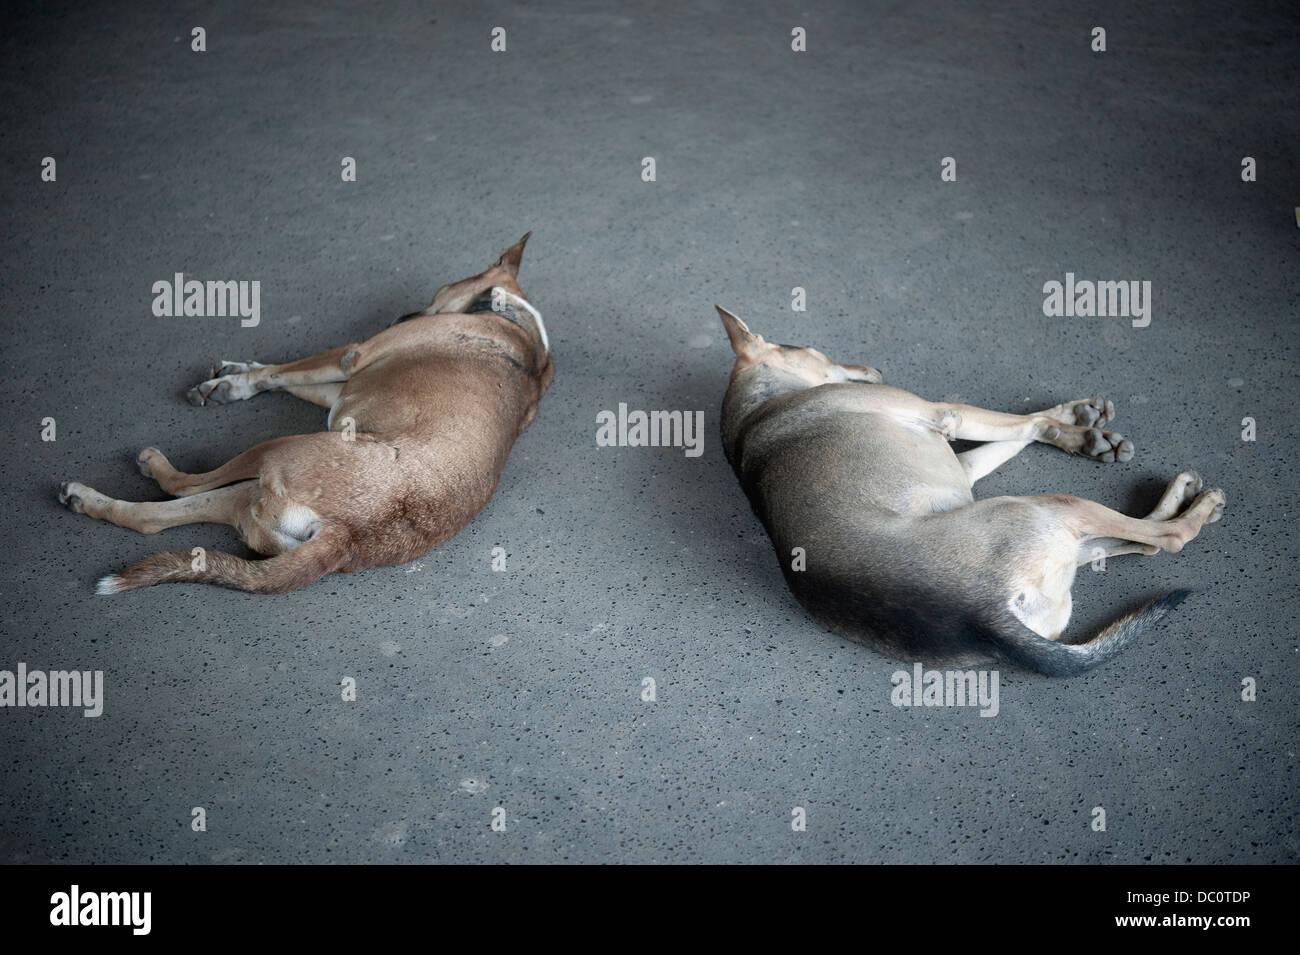 Stray dogs sleeping on concrete blocks in a Railway station, Mumbai, India - Stock Image